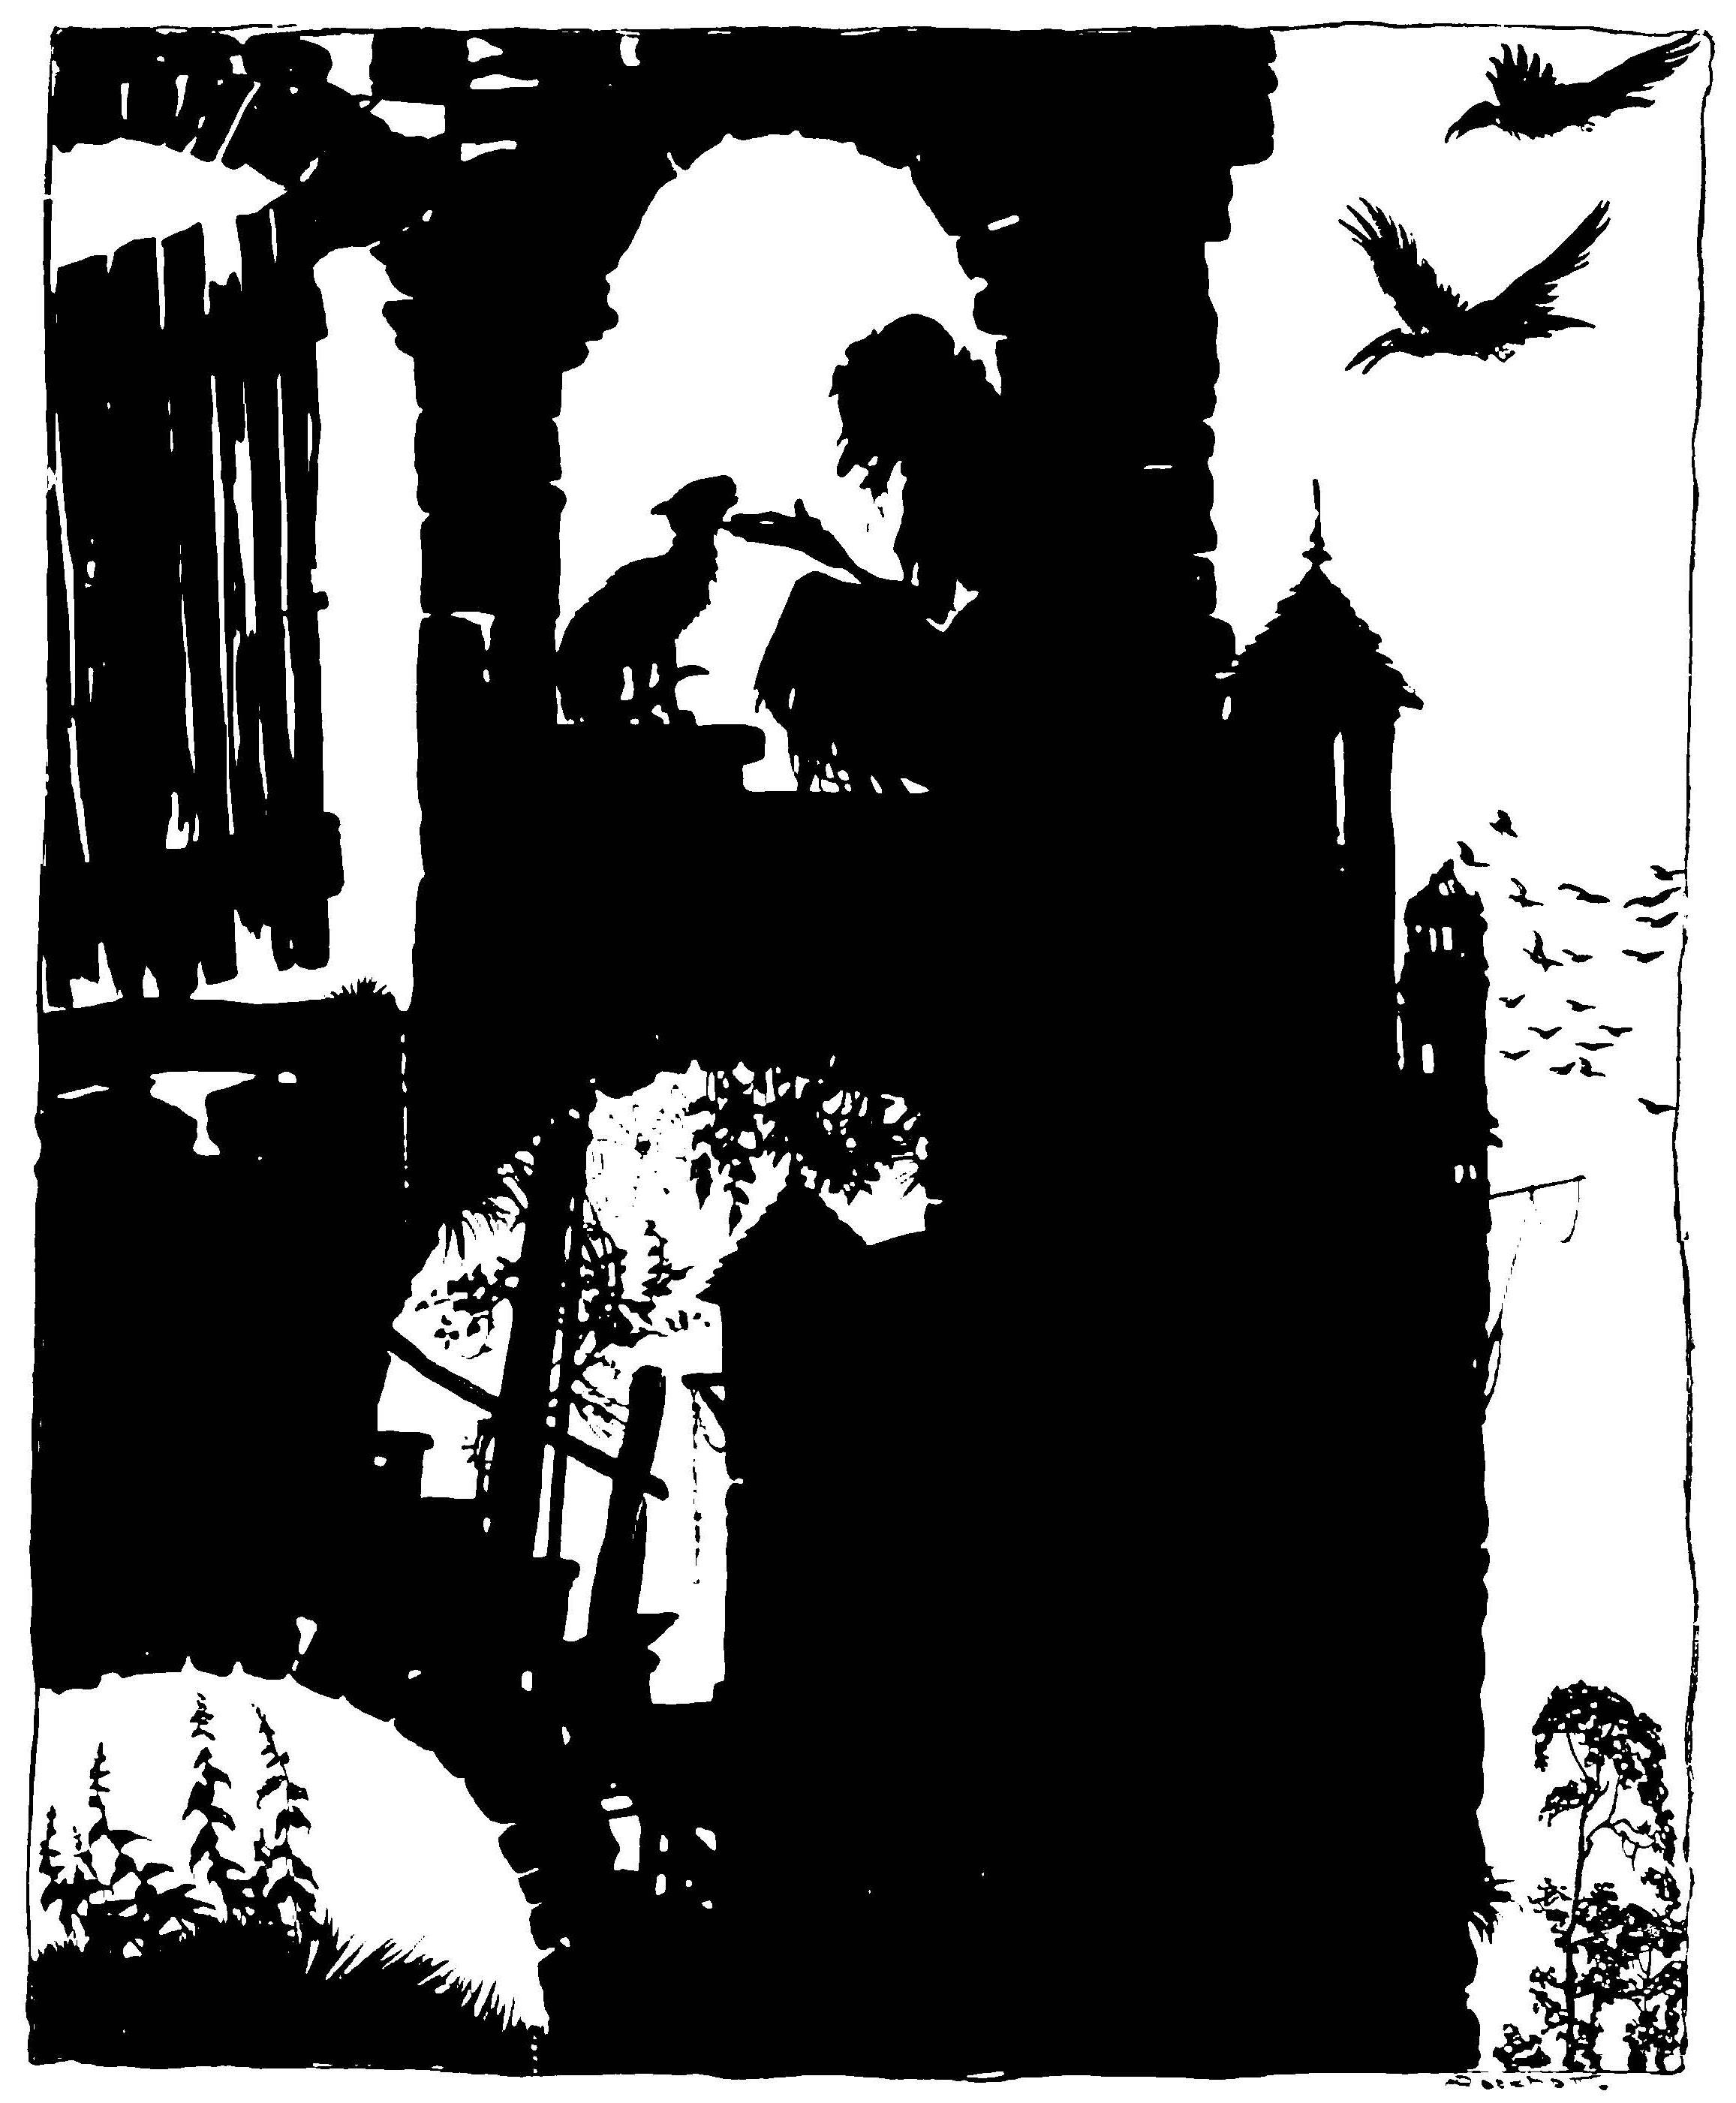 From The Sleeping Beauty by Arthur Rackham, 1920.